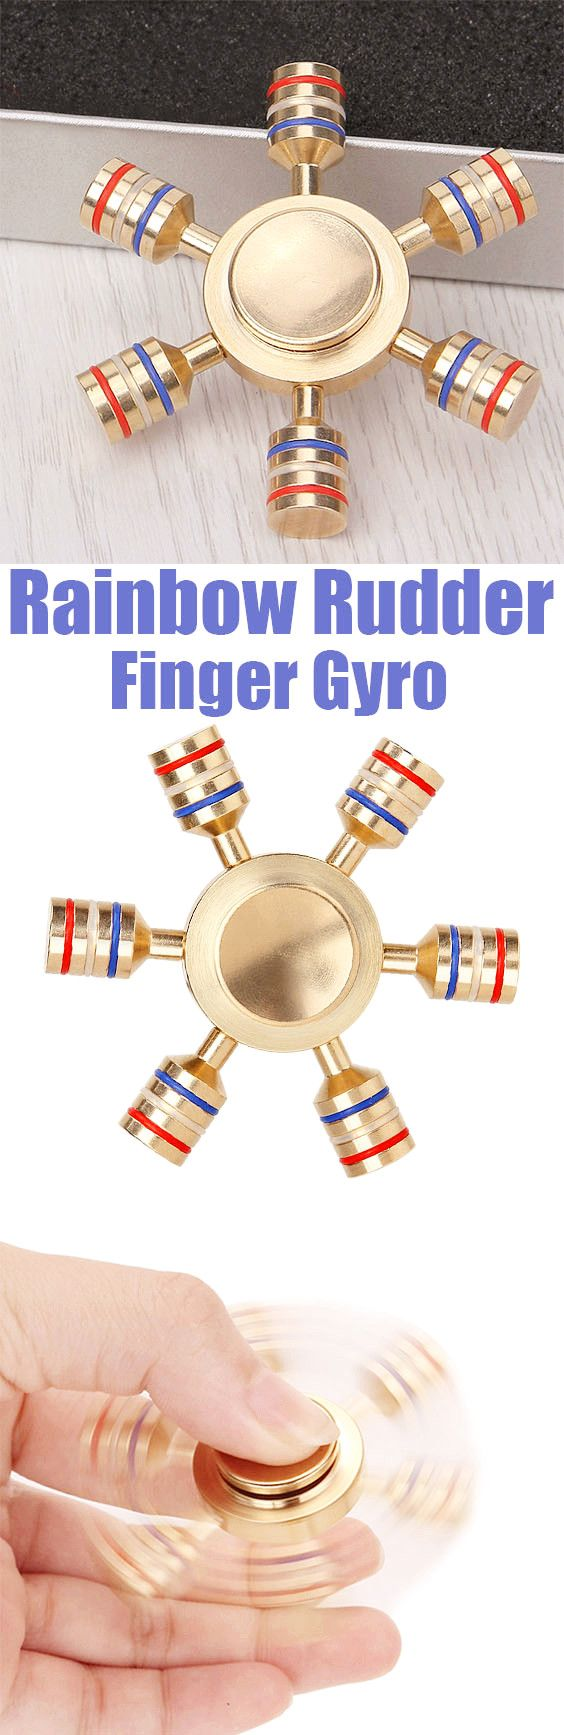 $7.13 Stress Relief Toy Rainbow Rudder Finger Gyro